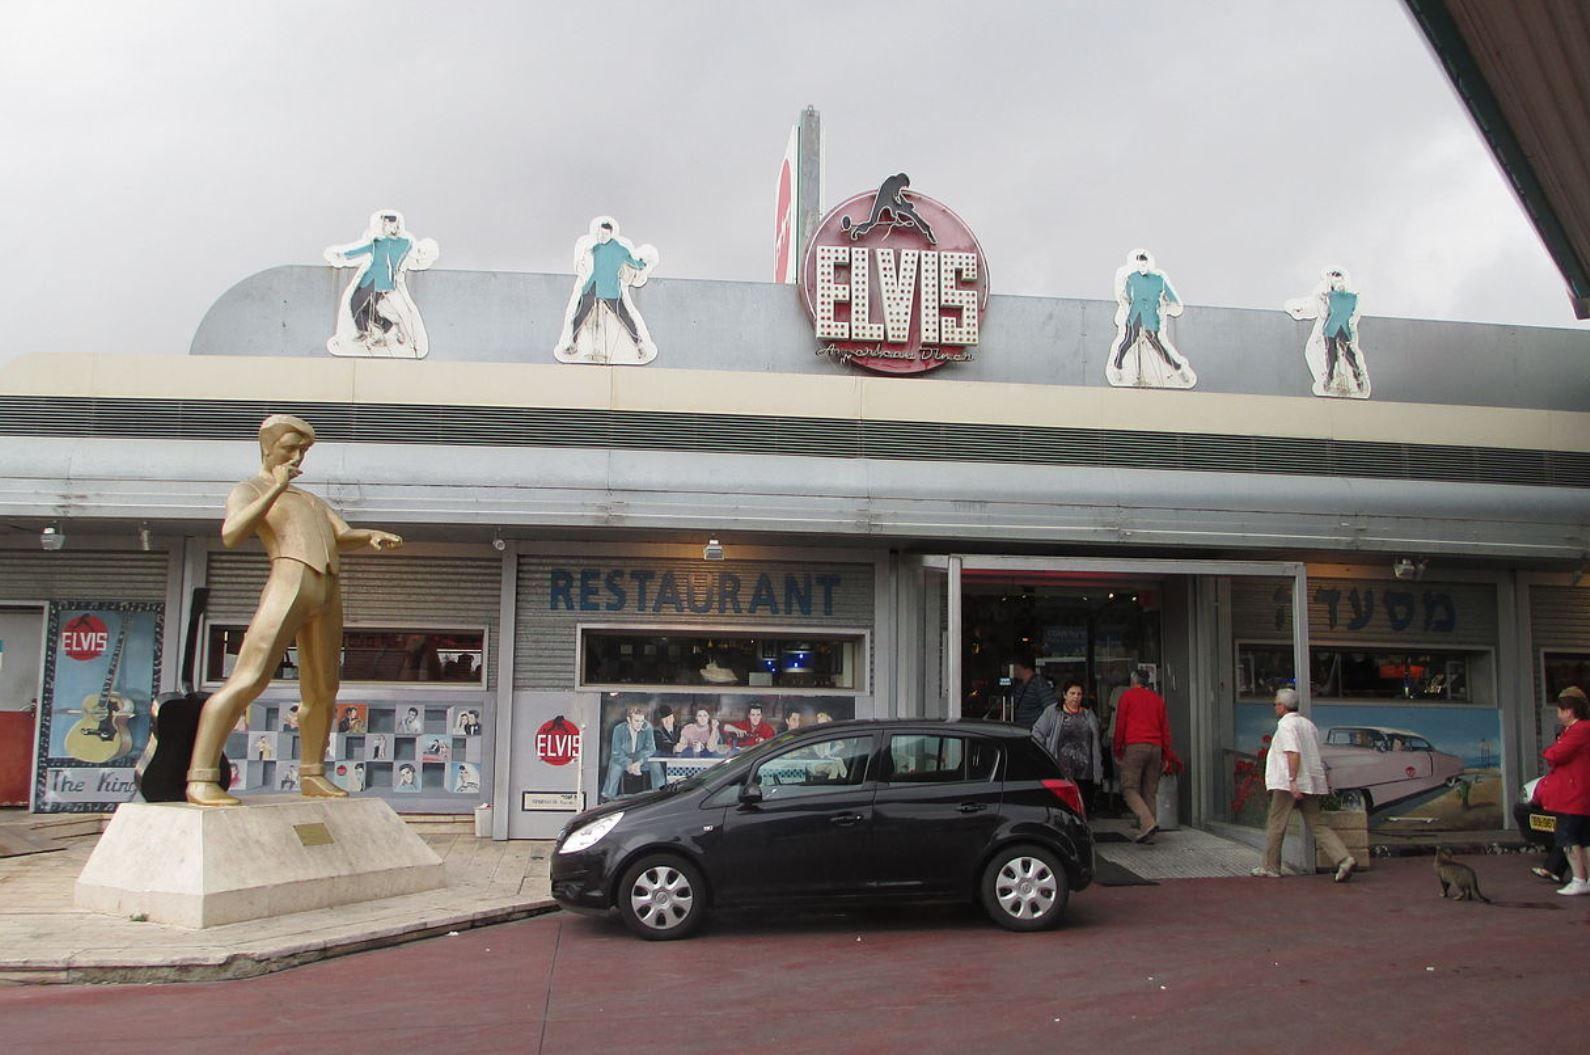 Photo of Elvis Inn via Wikimedia Commons.